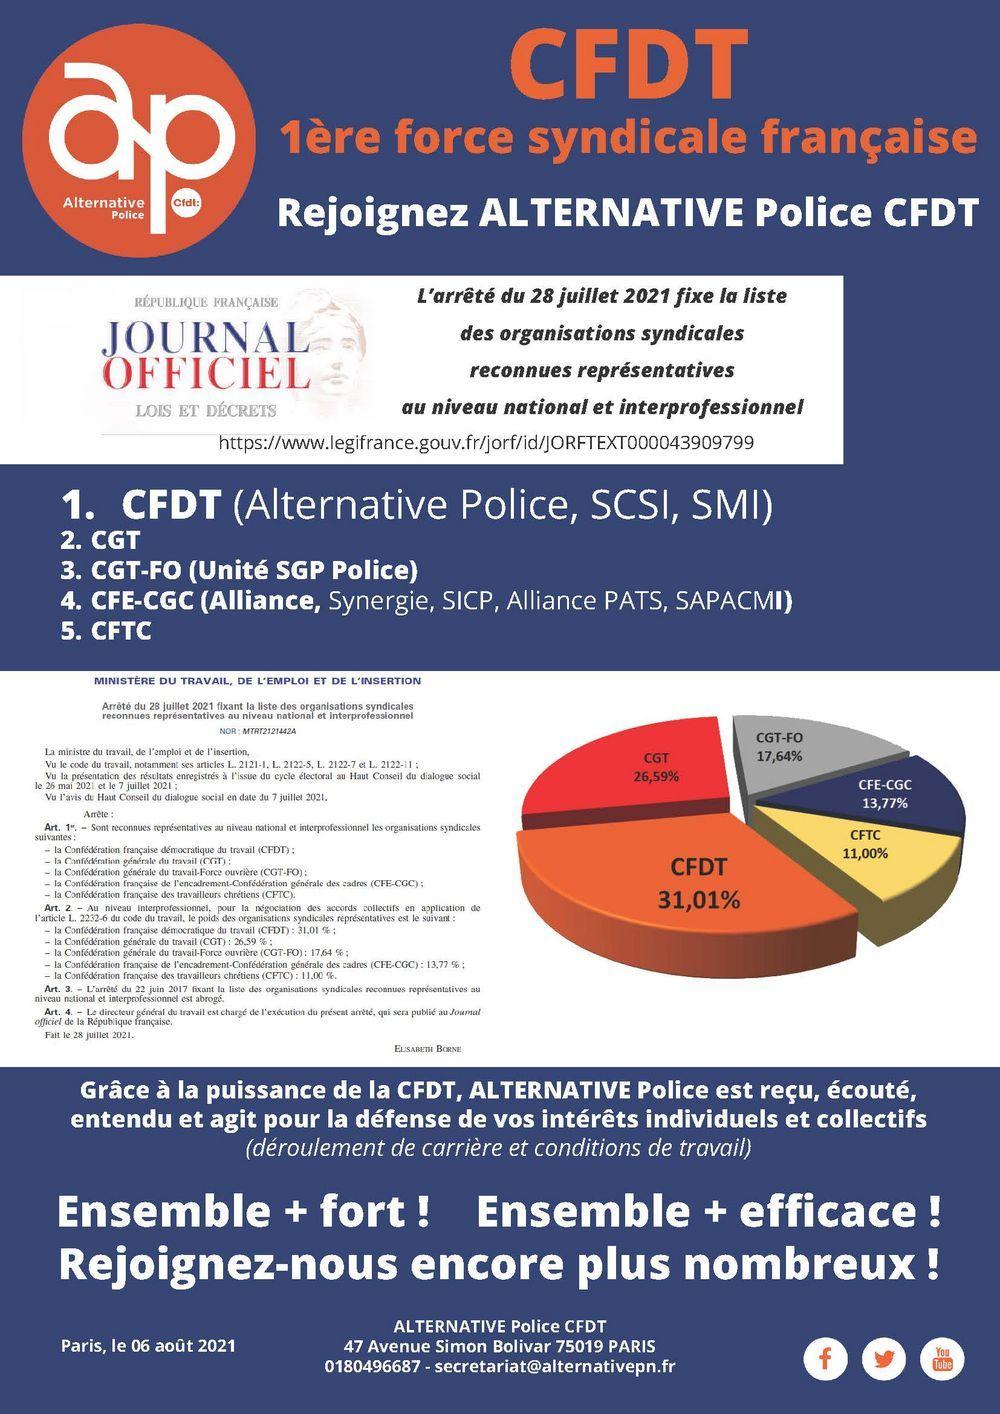 CFDT - 1ère force syndicale française